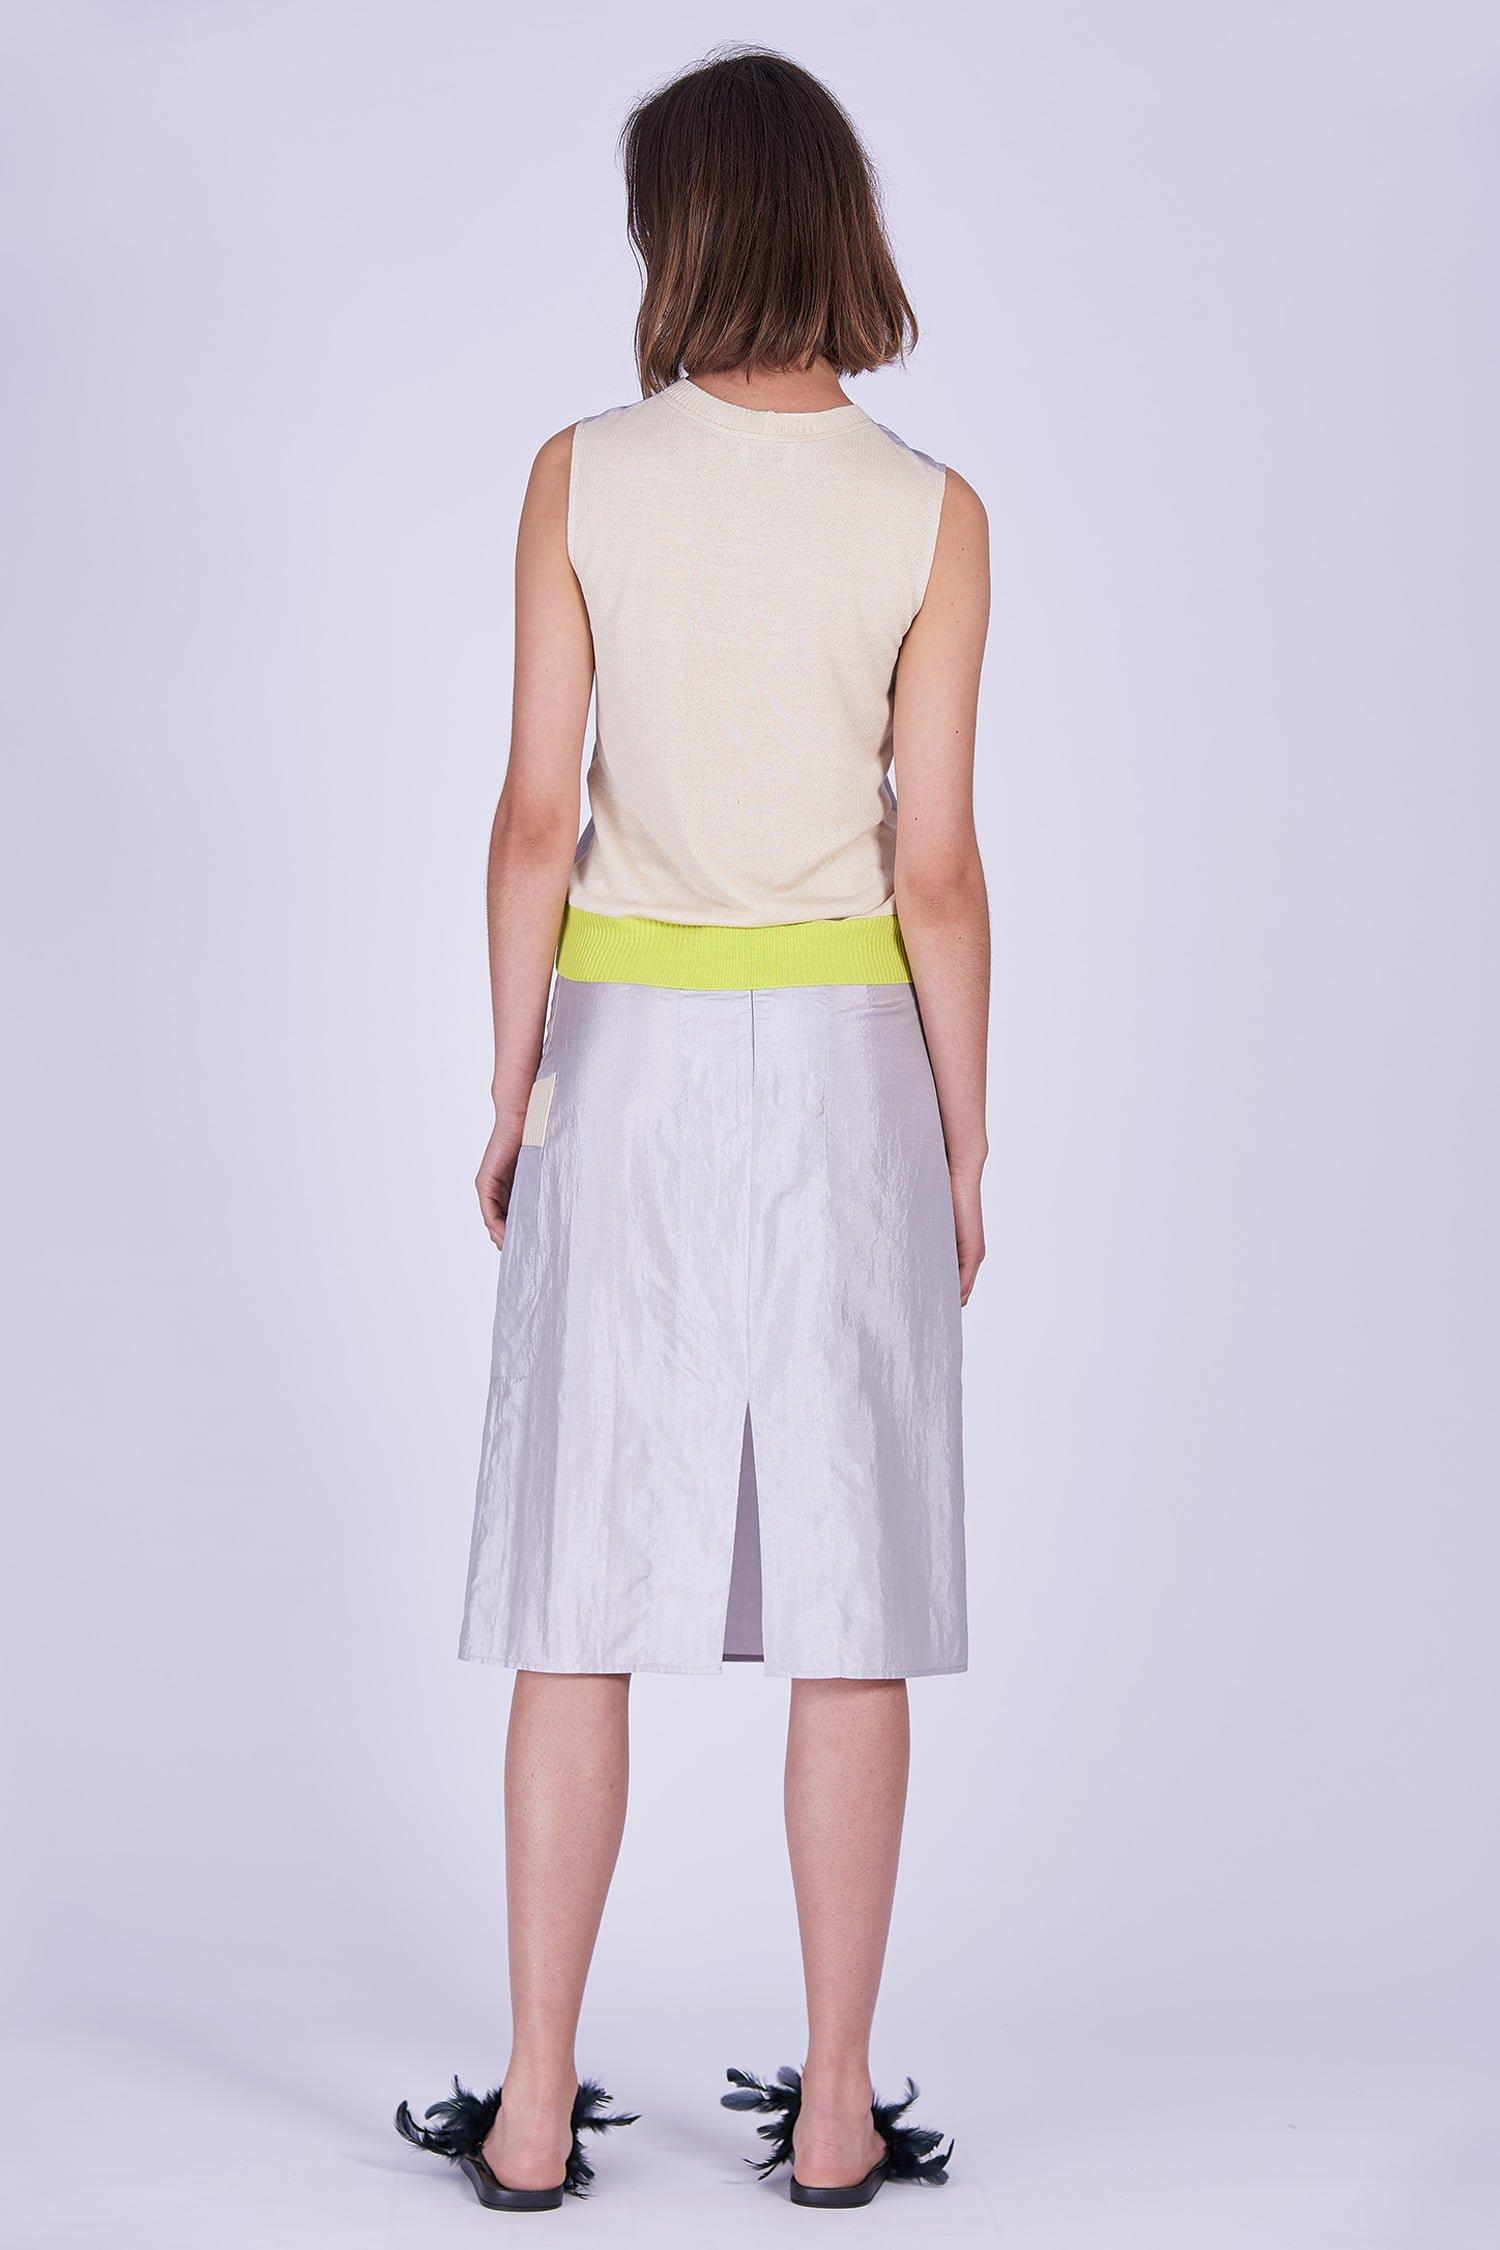 Acephala Ss2020 Silver Bustier Top Midi Skirt Srebrny Gorsetowy Srebrna Spodnica Back